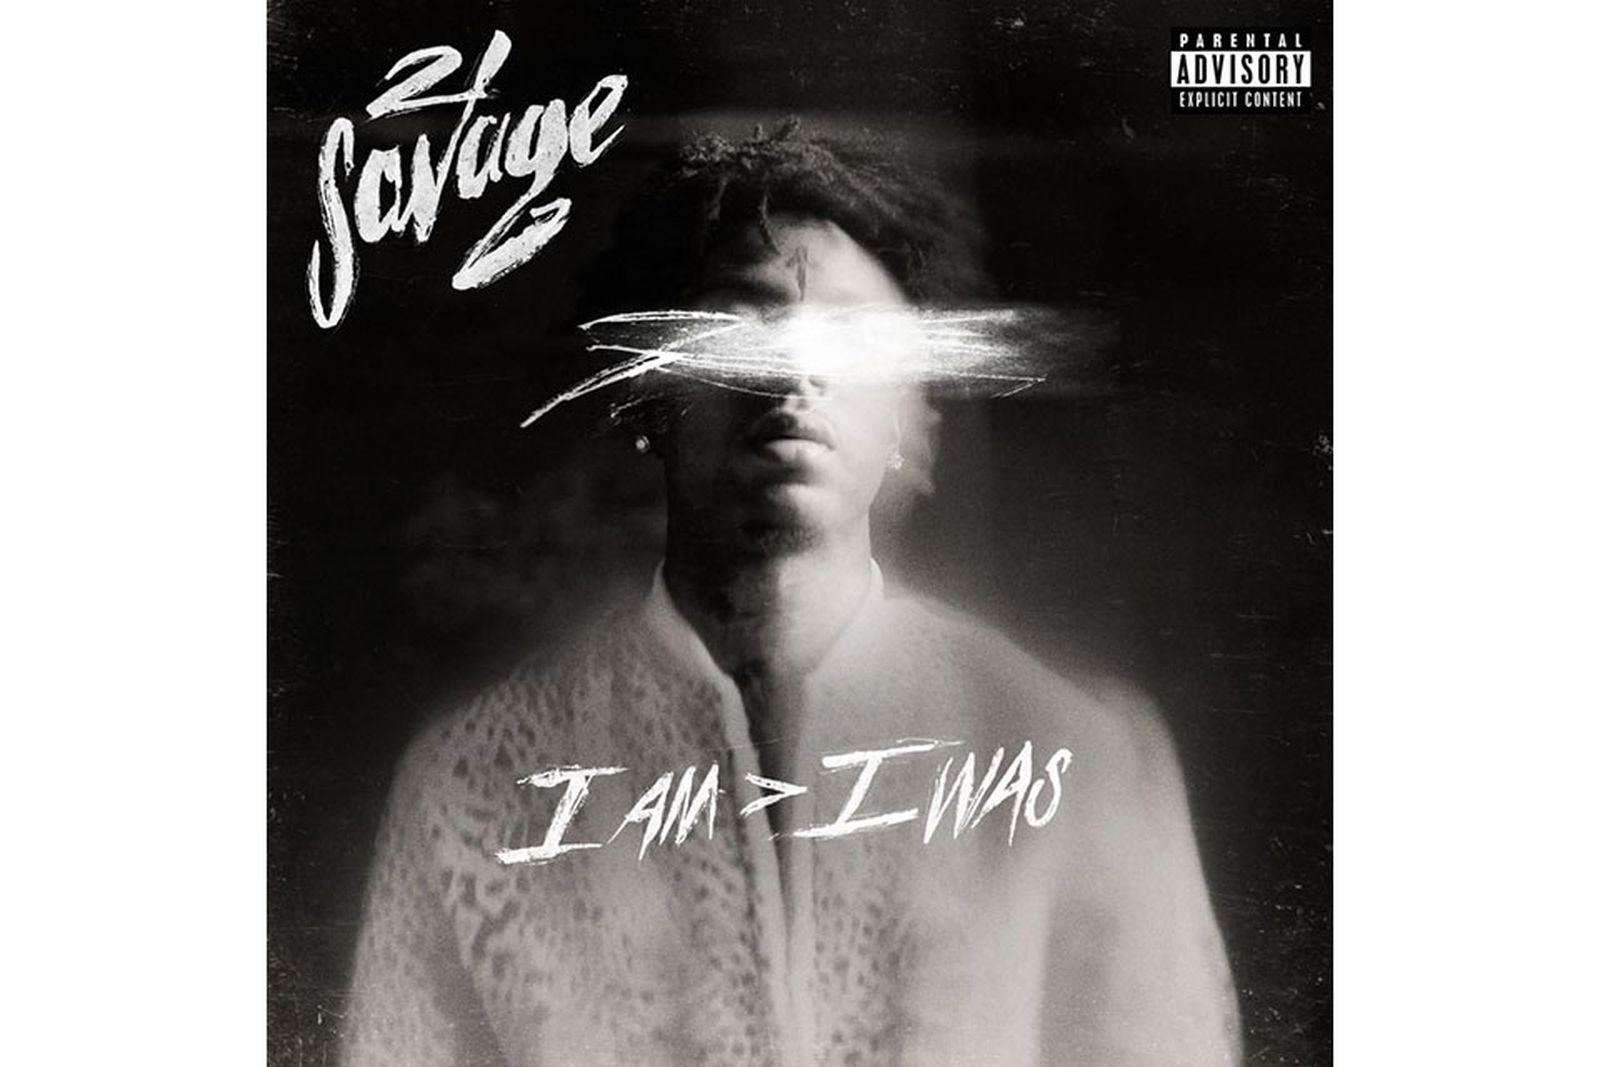 21 savage i am i was review I Am > I Was